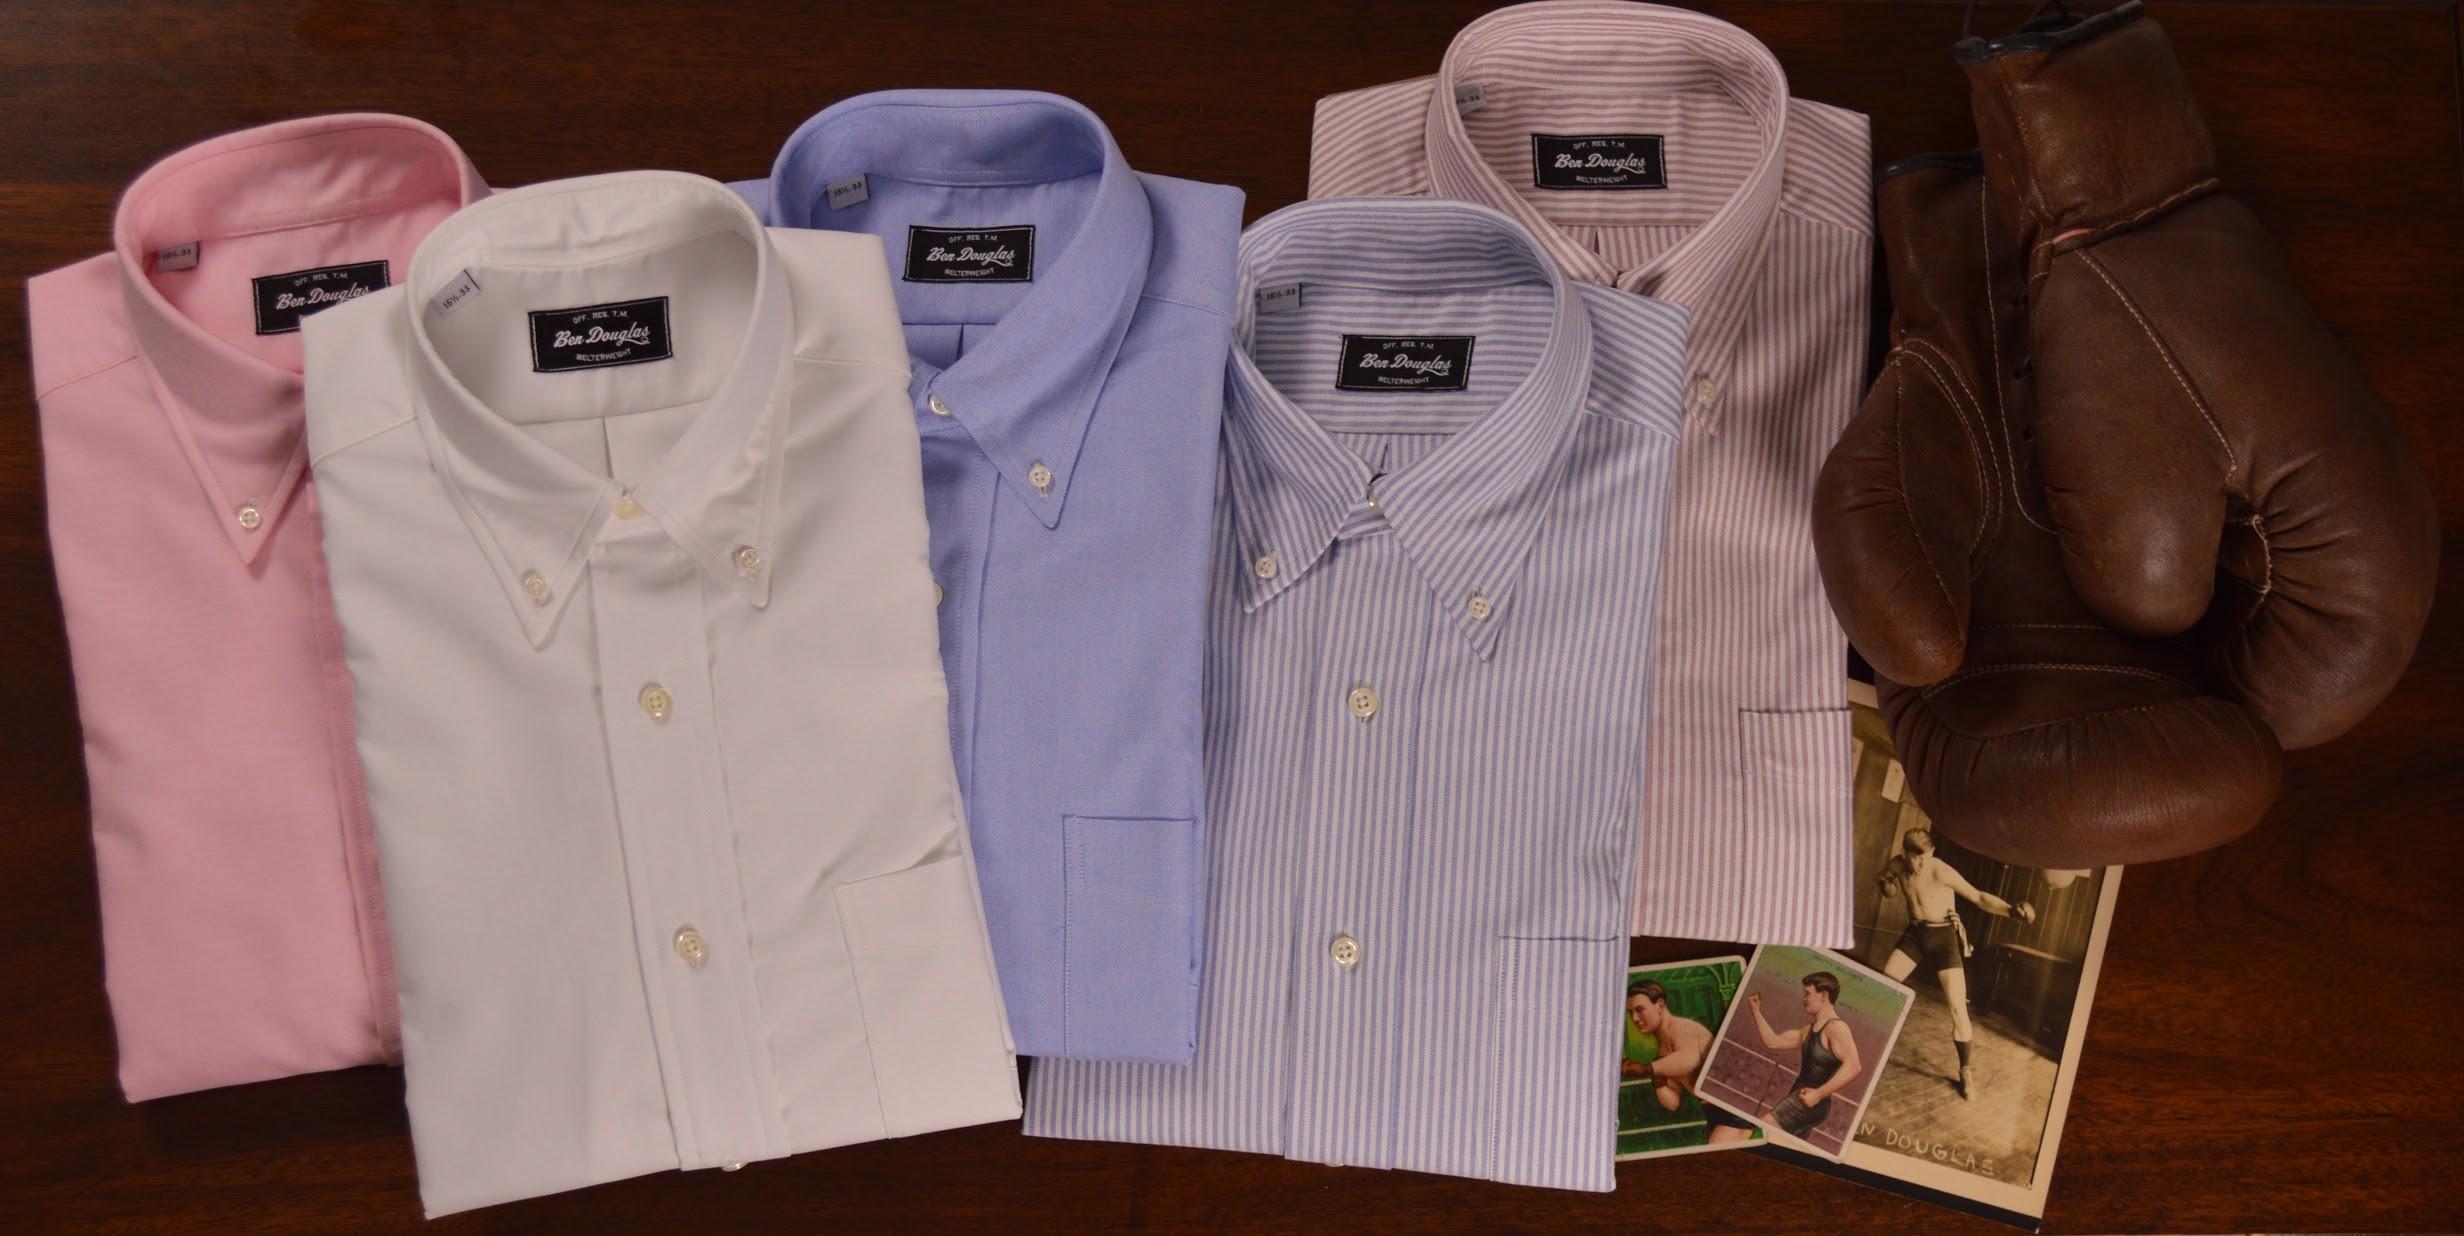 Ben Douglas Kickstarter Campaign And The Return Of The Detachable Collar